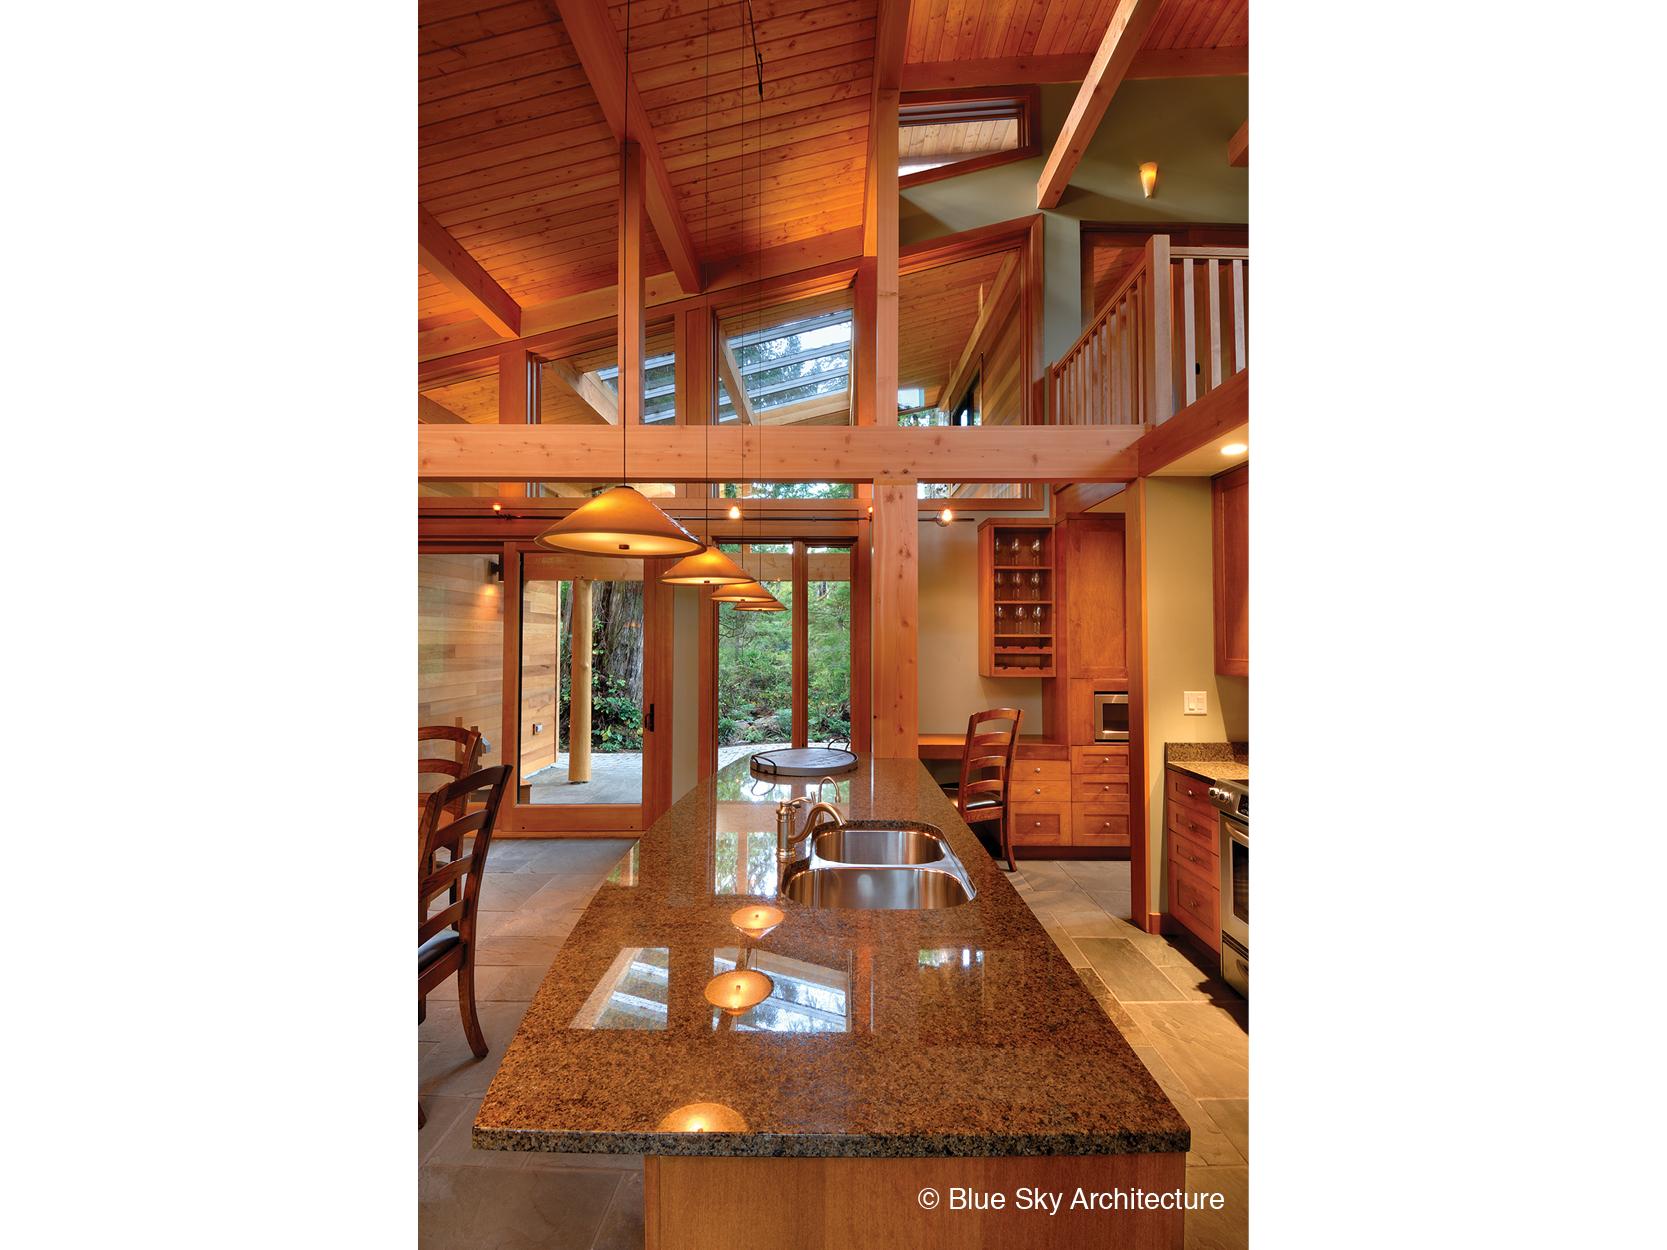 All wood organic design of Rainforest House kitchen